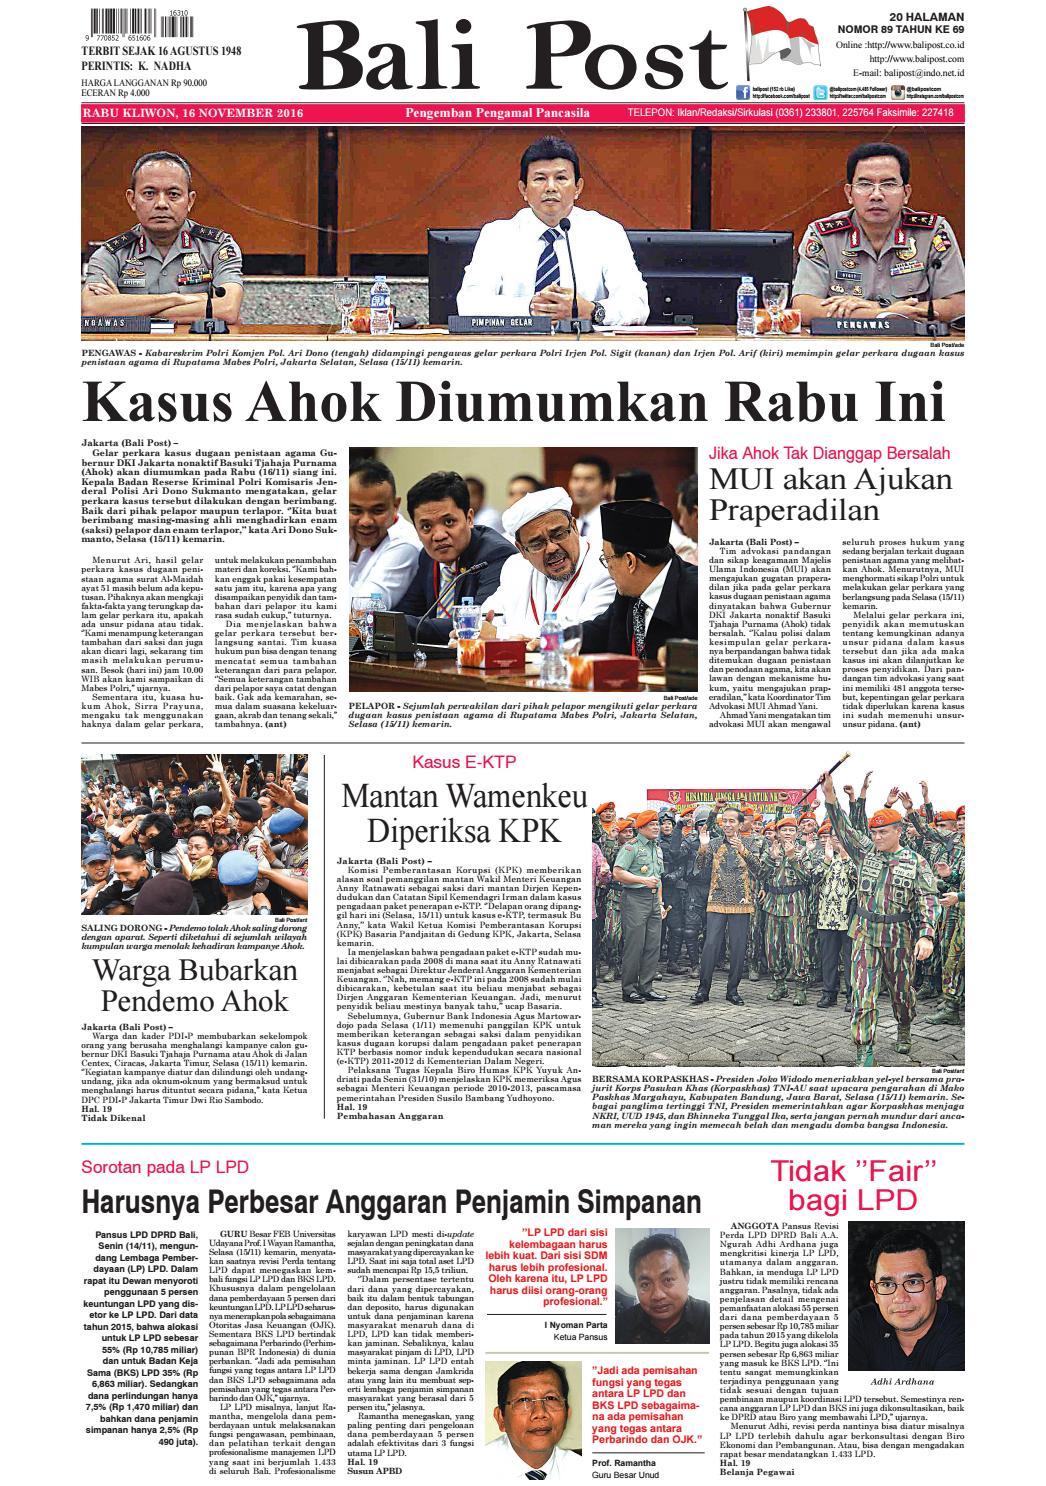 Edisi 16 November 2016 Balipostcom By E Paper Kmb Issuu Baju Tdr Frozen Mail Lpk